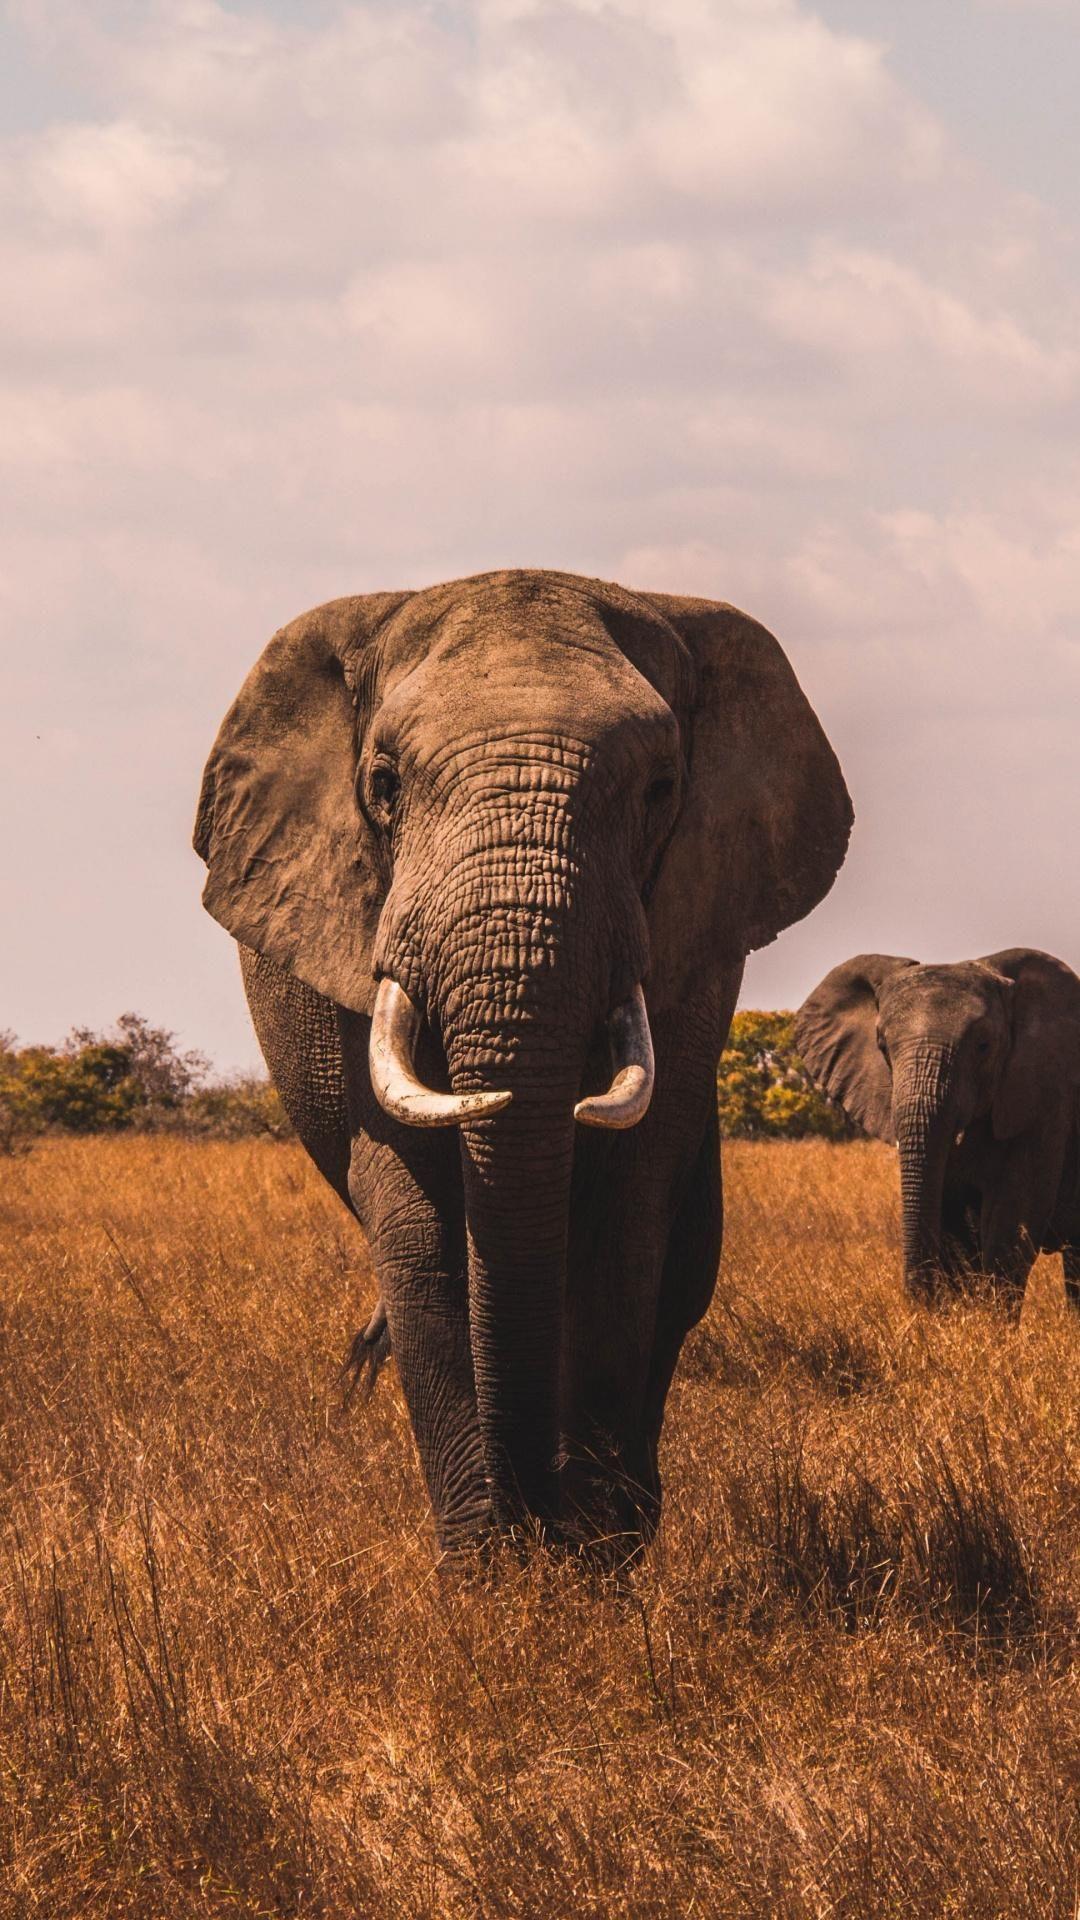 Photo of Elefant Wallpapaer Hintergrundbild